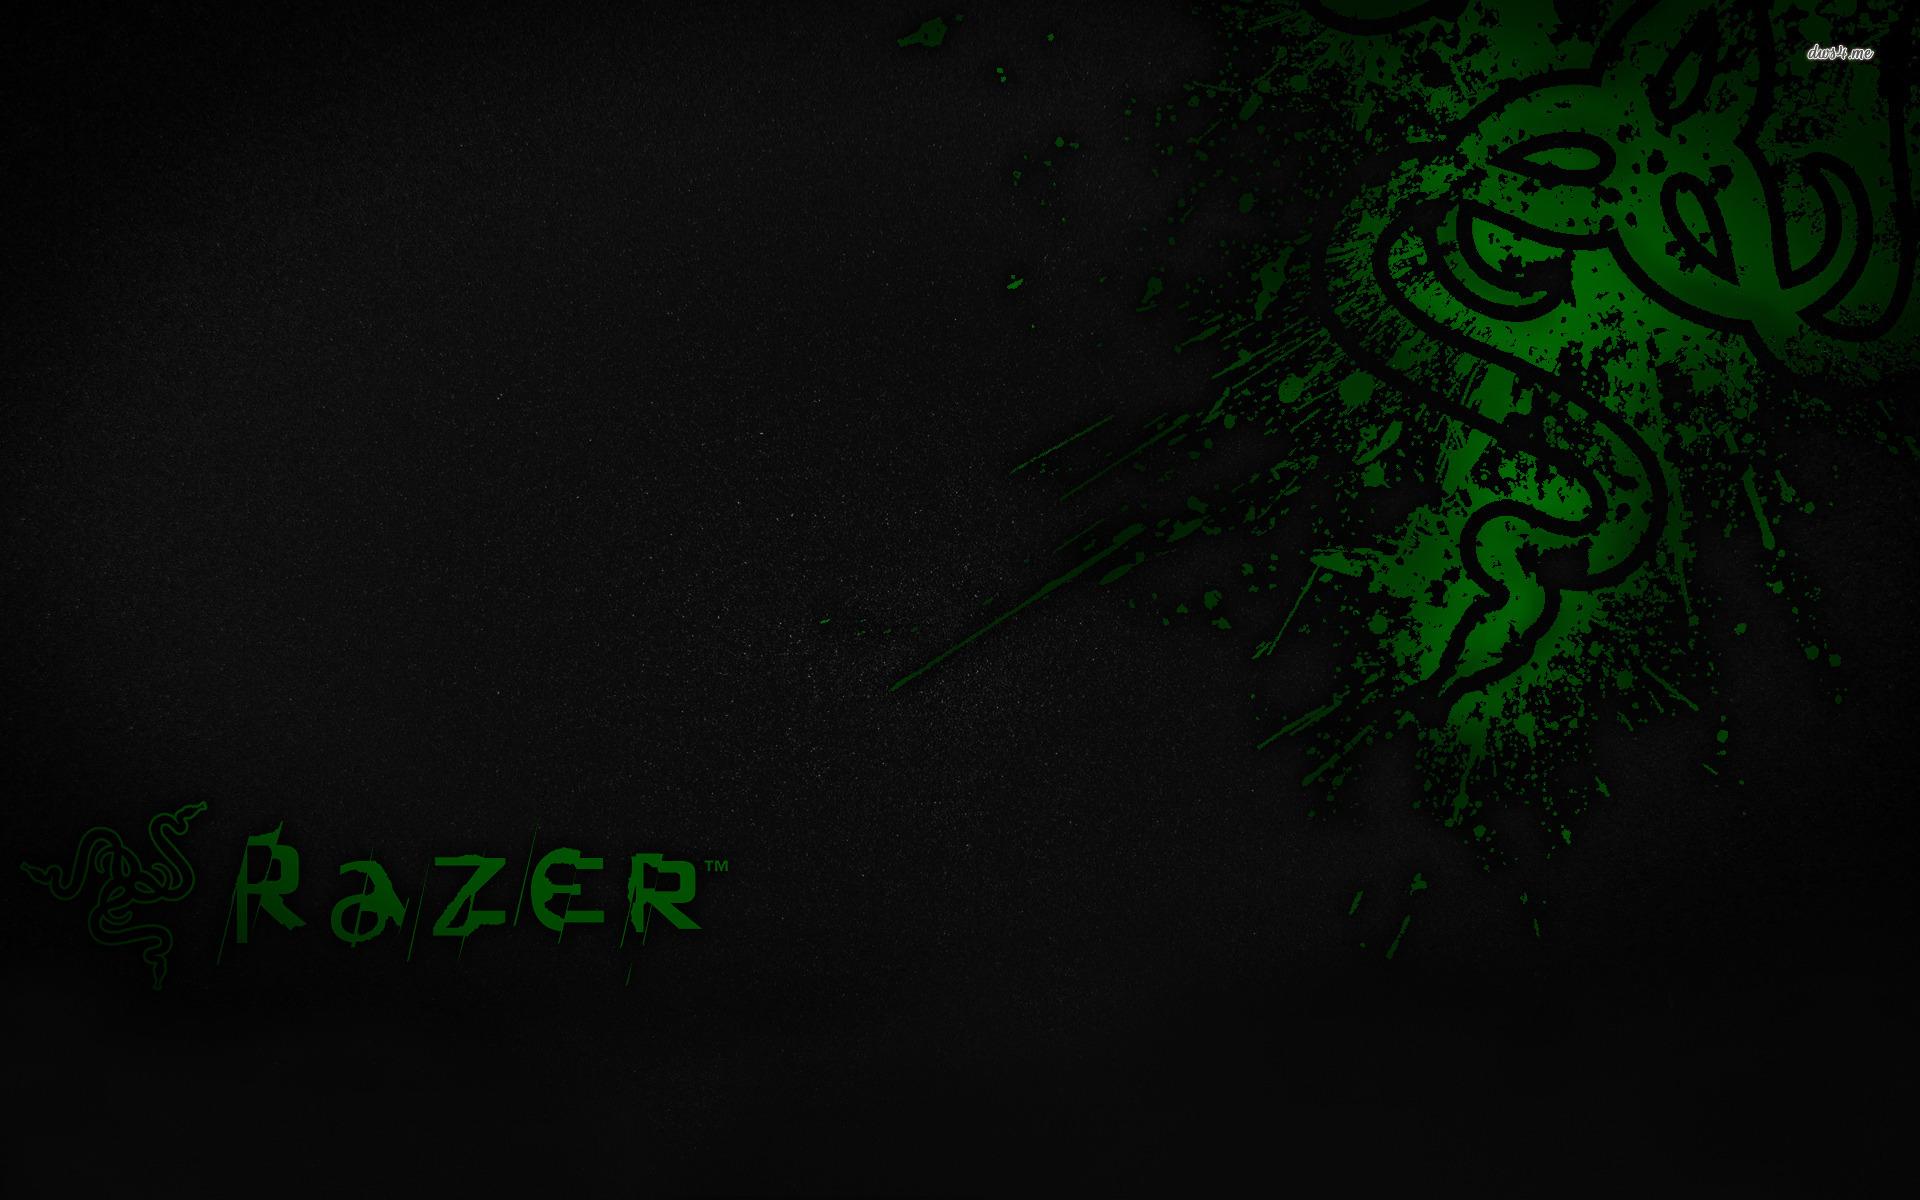 Razer wallpaper   Computer wallpapers   3933 1920x1200